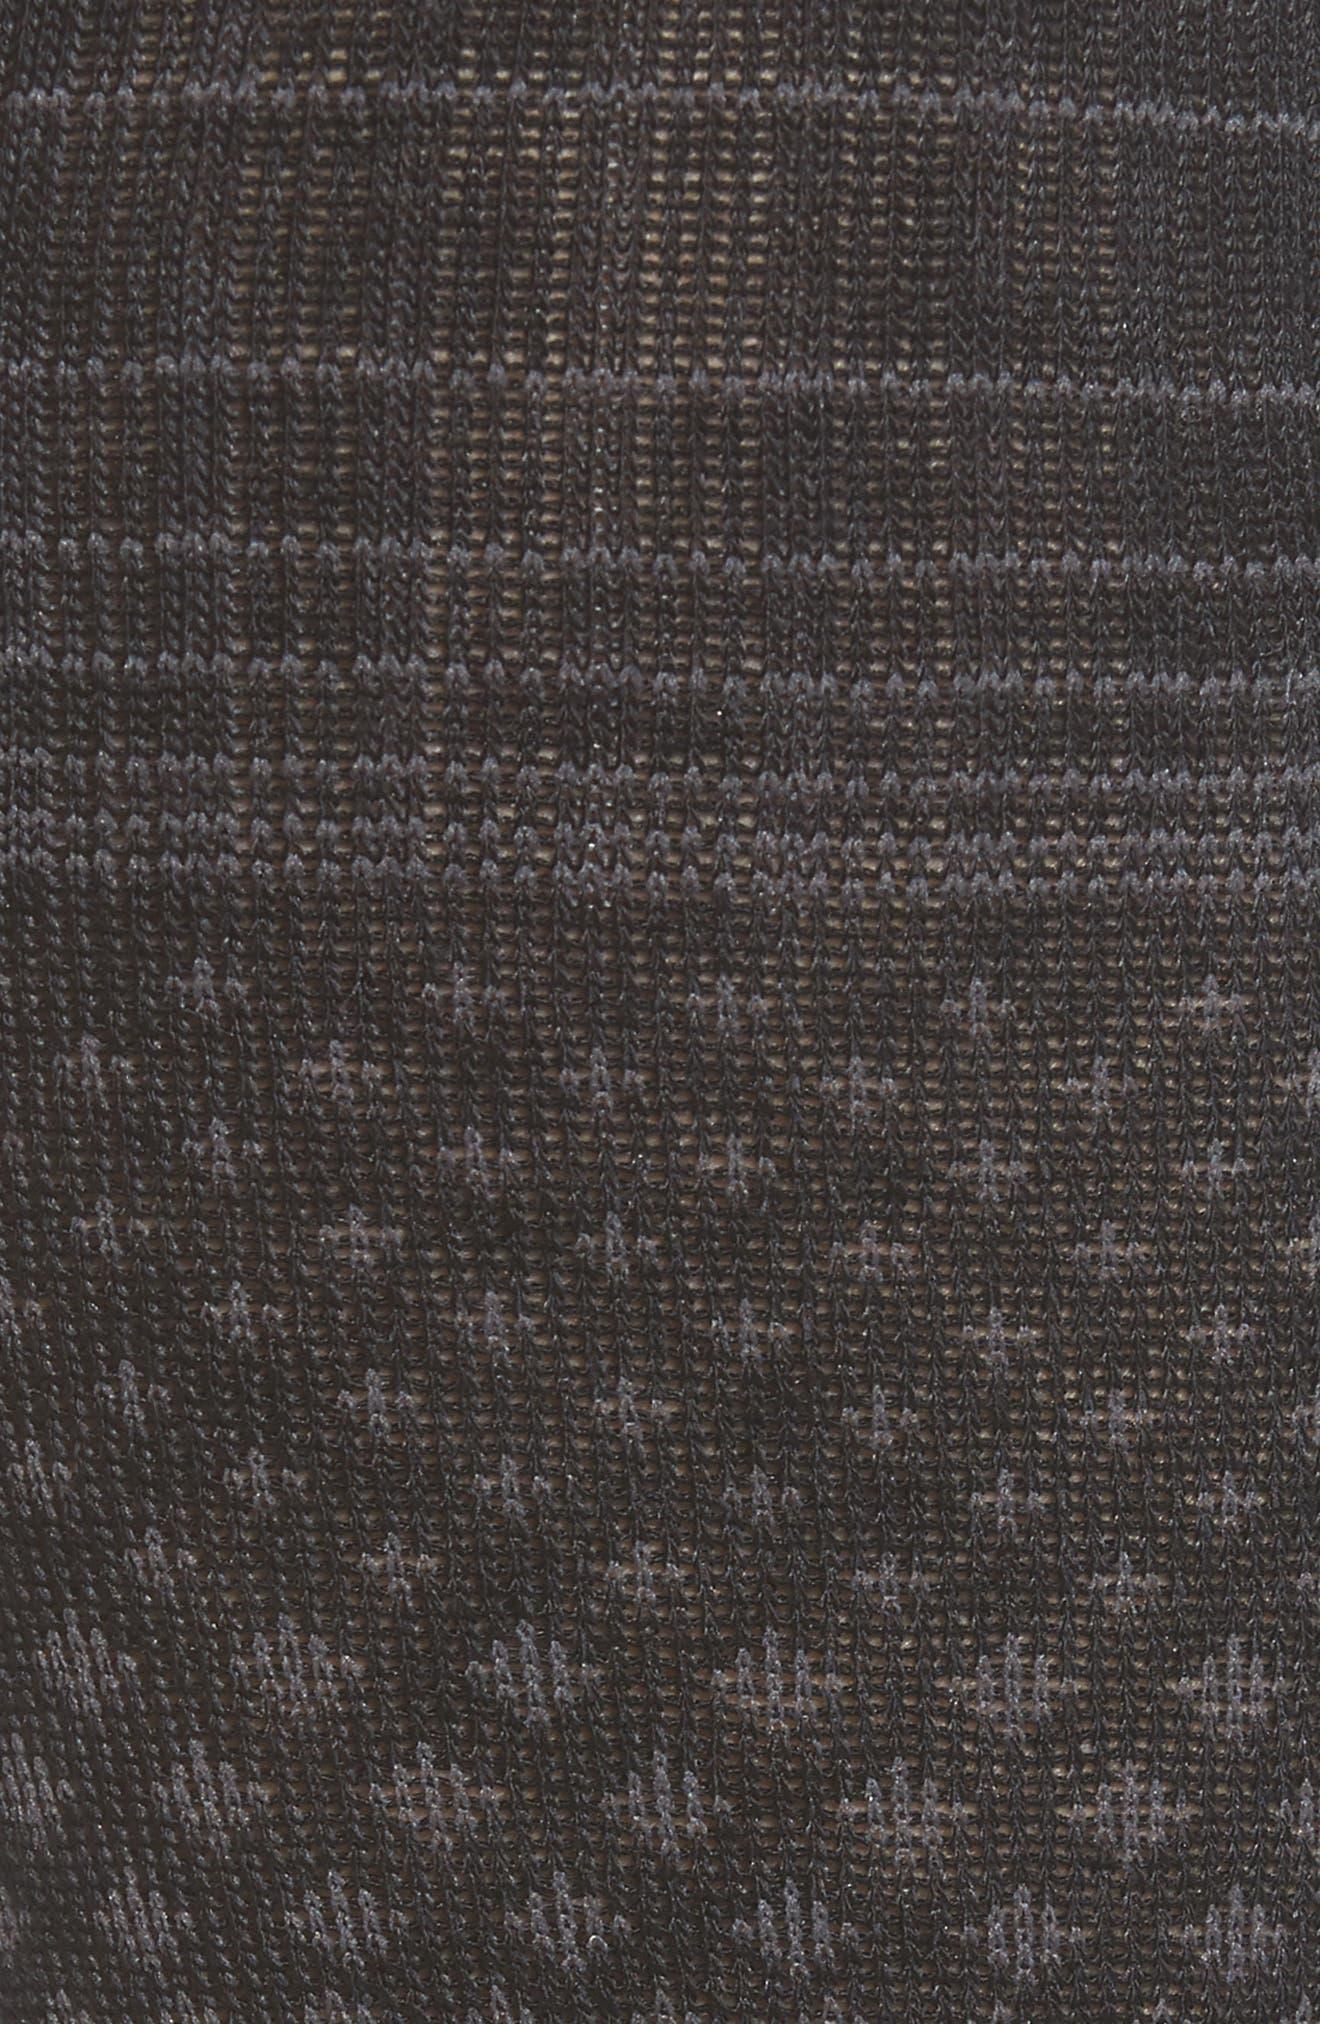 Micro Grade Compression Knee Socks,                             Alternate thumbnail 2, color,                             001